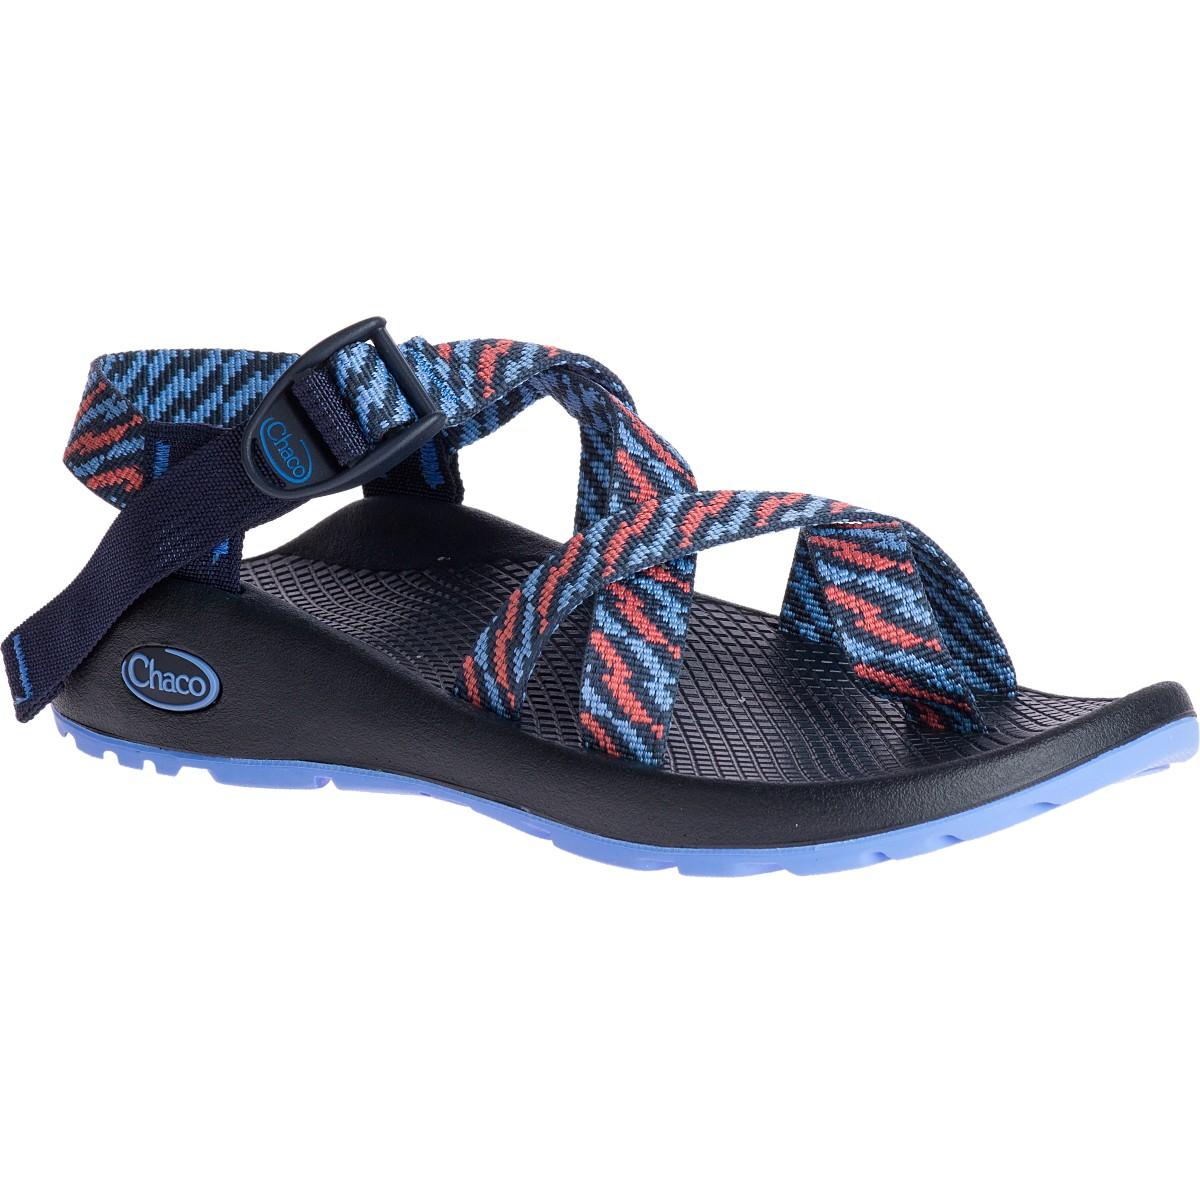 368d16140eb6 Chaco Z2 Classic Sandal - Womens